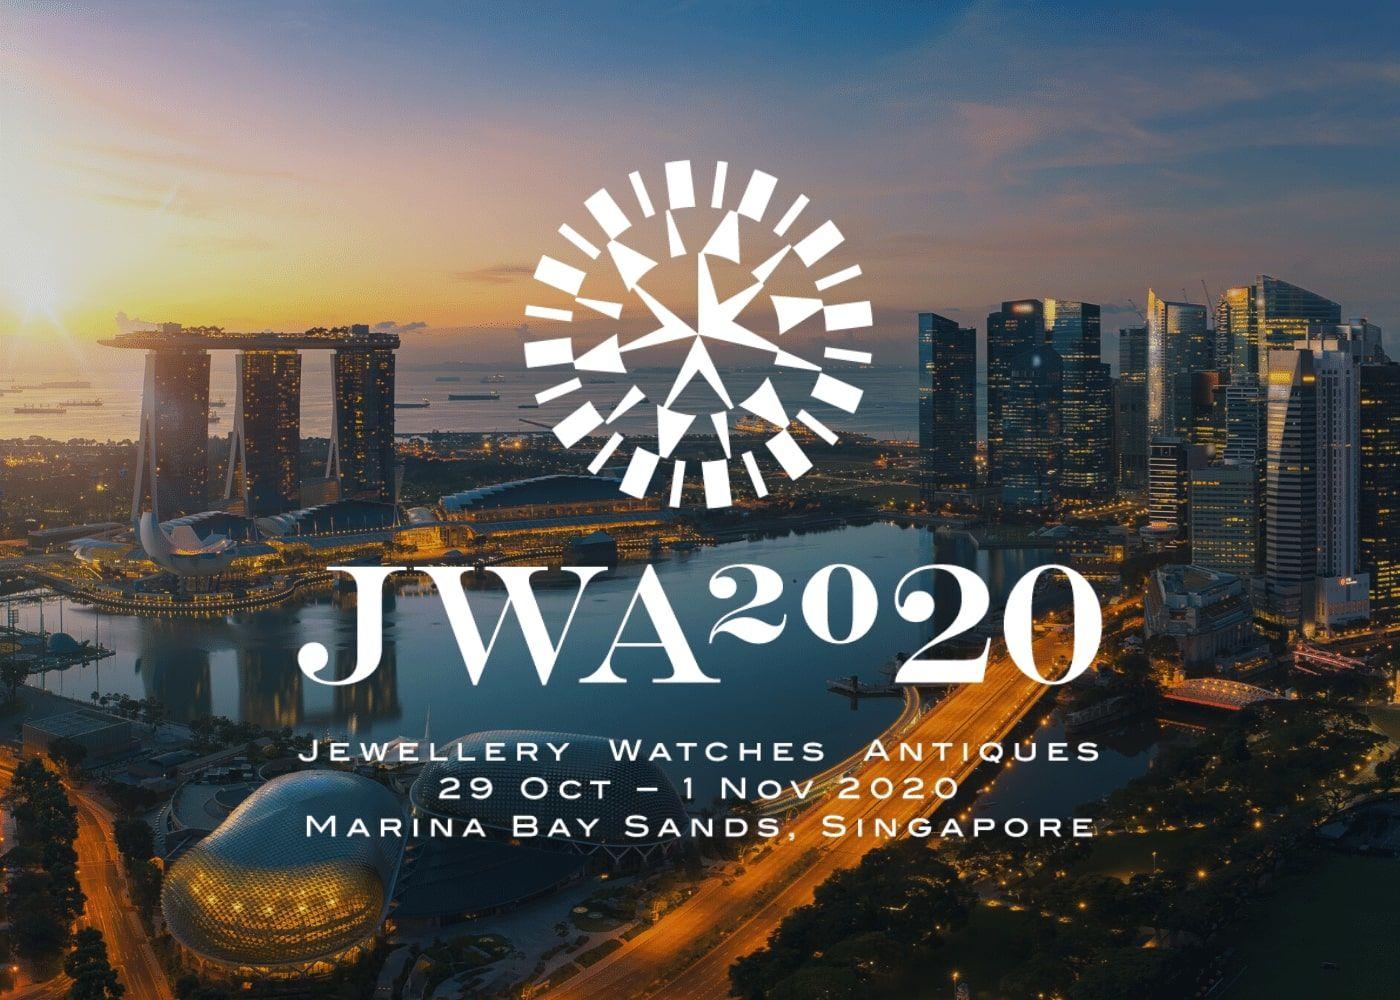 JWA 2020: 29 Oct – 1 Nov 2020 (Singapore)